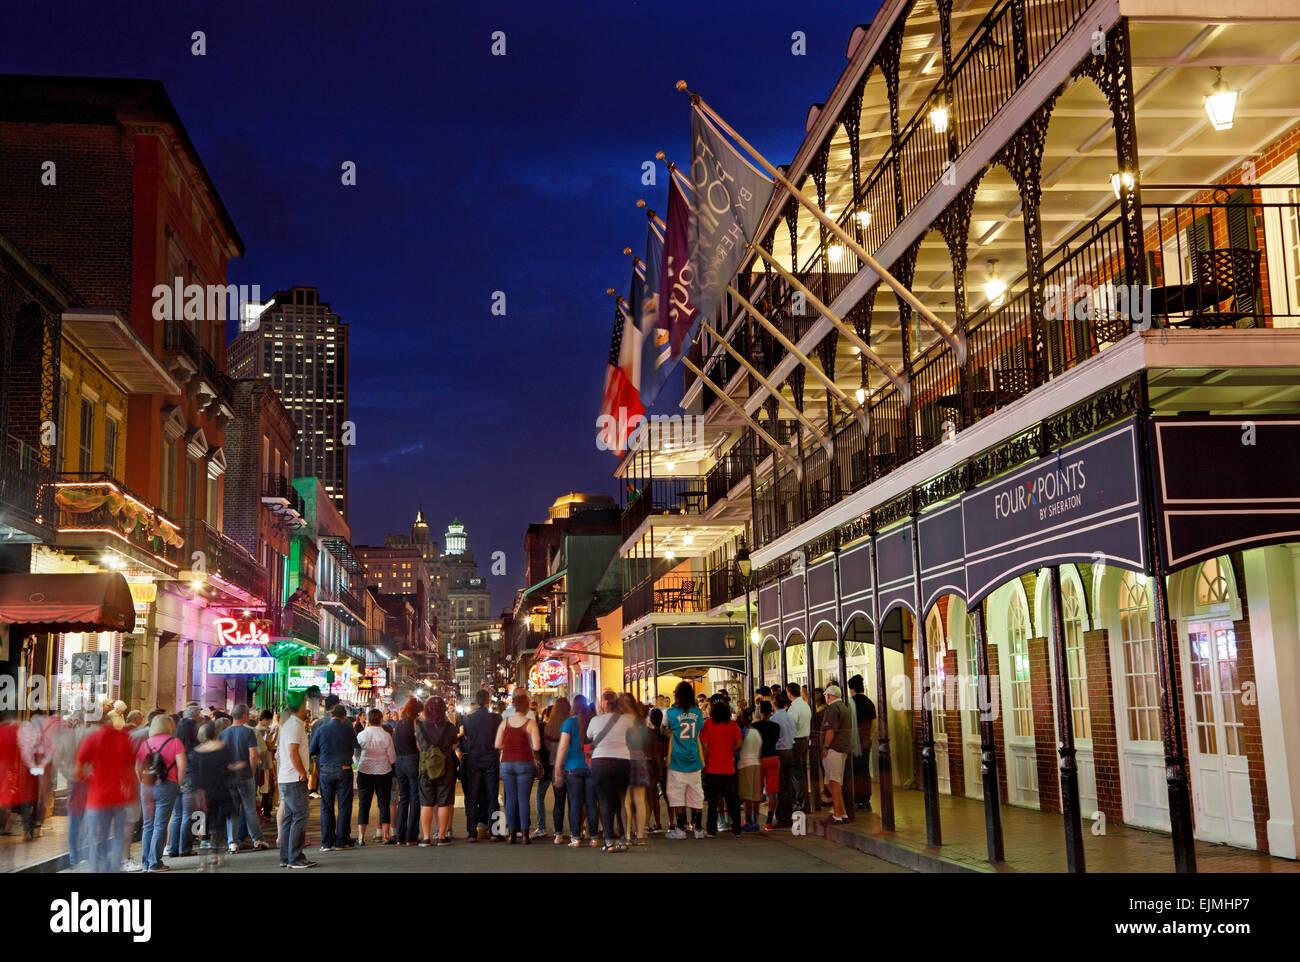 Hotels On Bourbon Street New Orleans